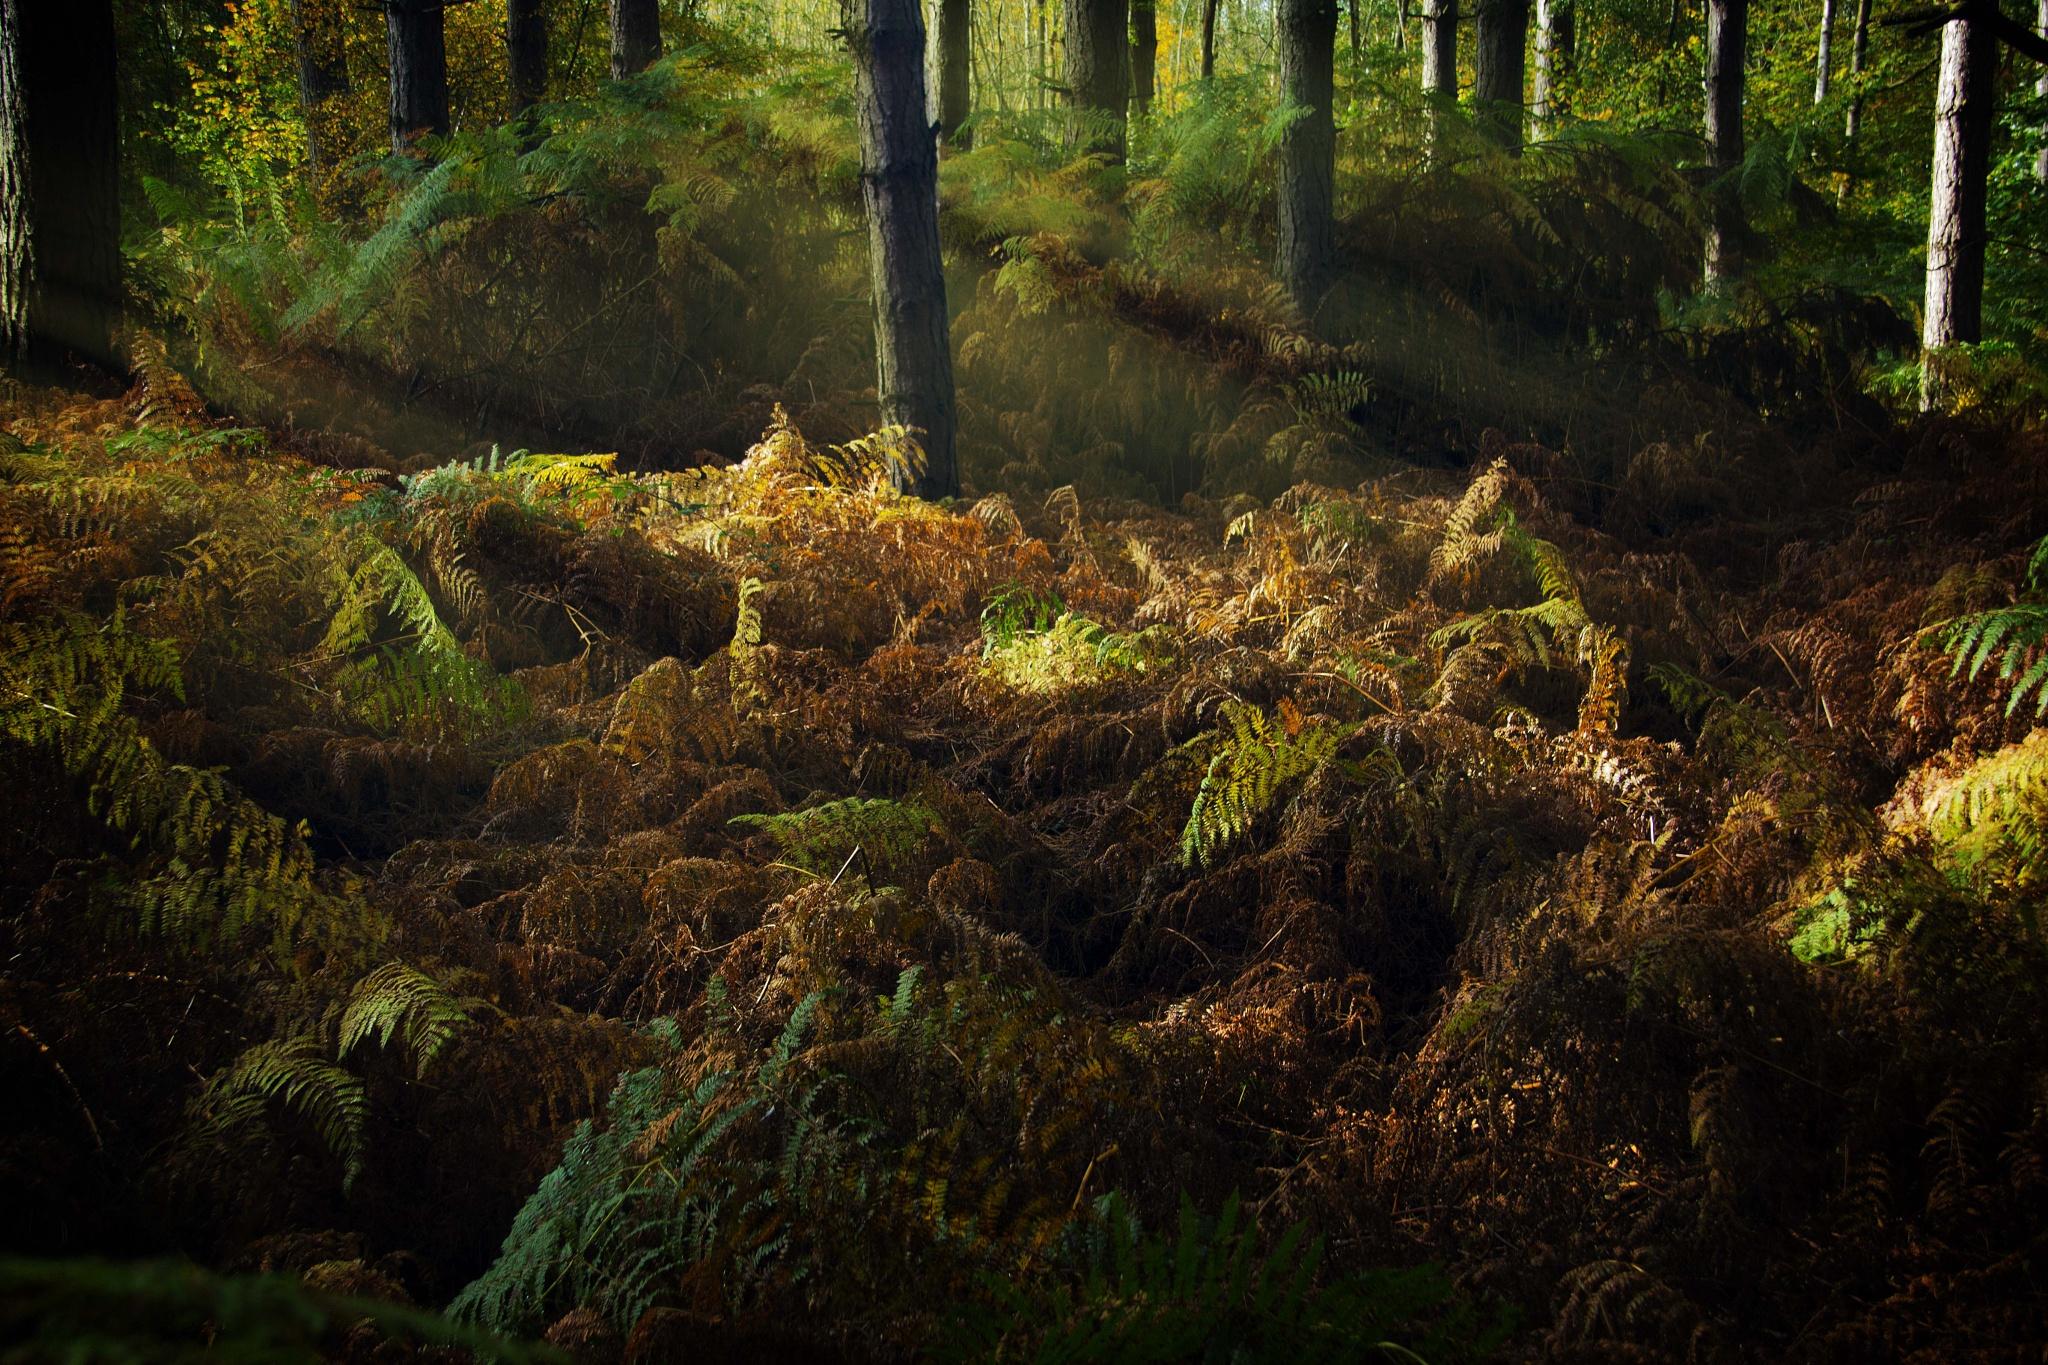 Woodland Rays by Willpower